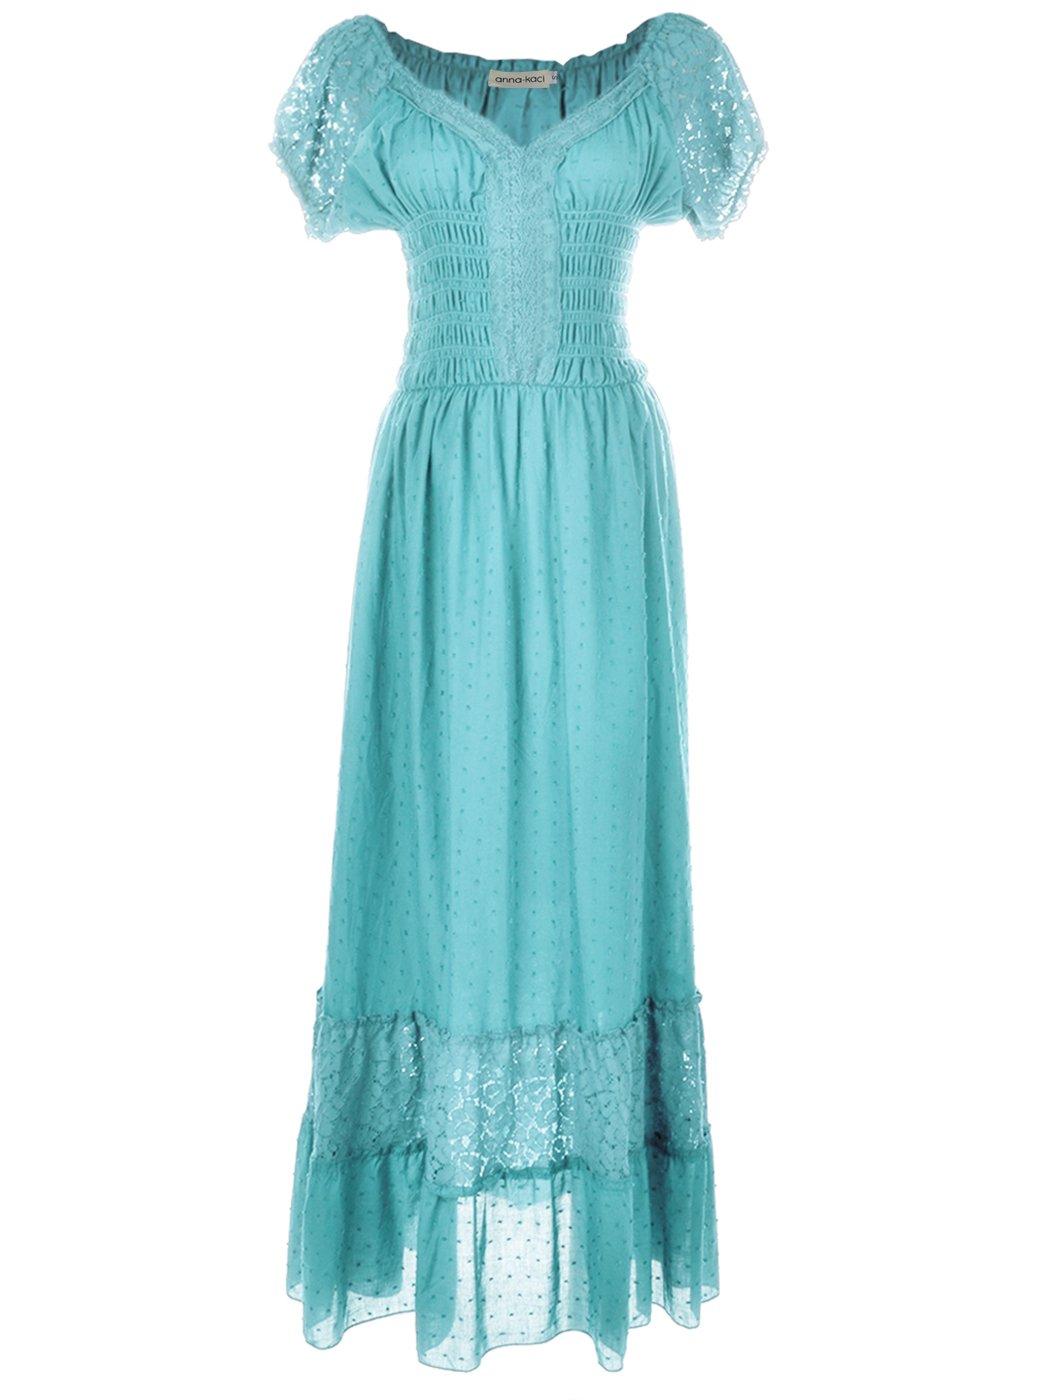 Renaissance Maiden Inspired Aqua Blue Lace Cap Sleeve Trim Chemise Underdress - DeluxeAdultCostumes.com